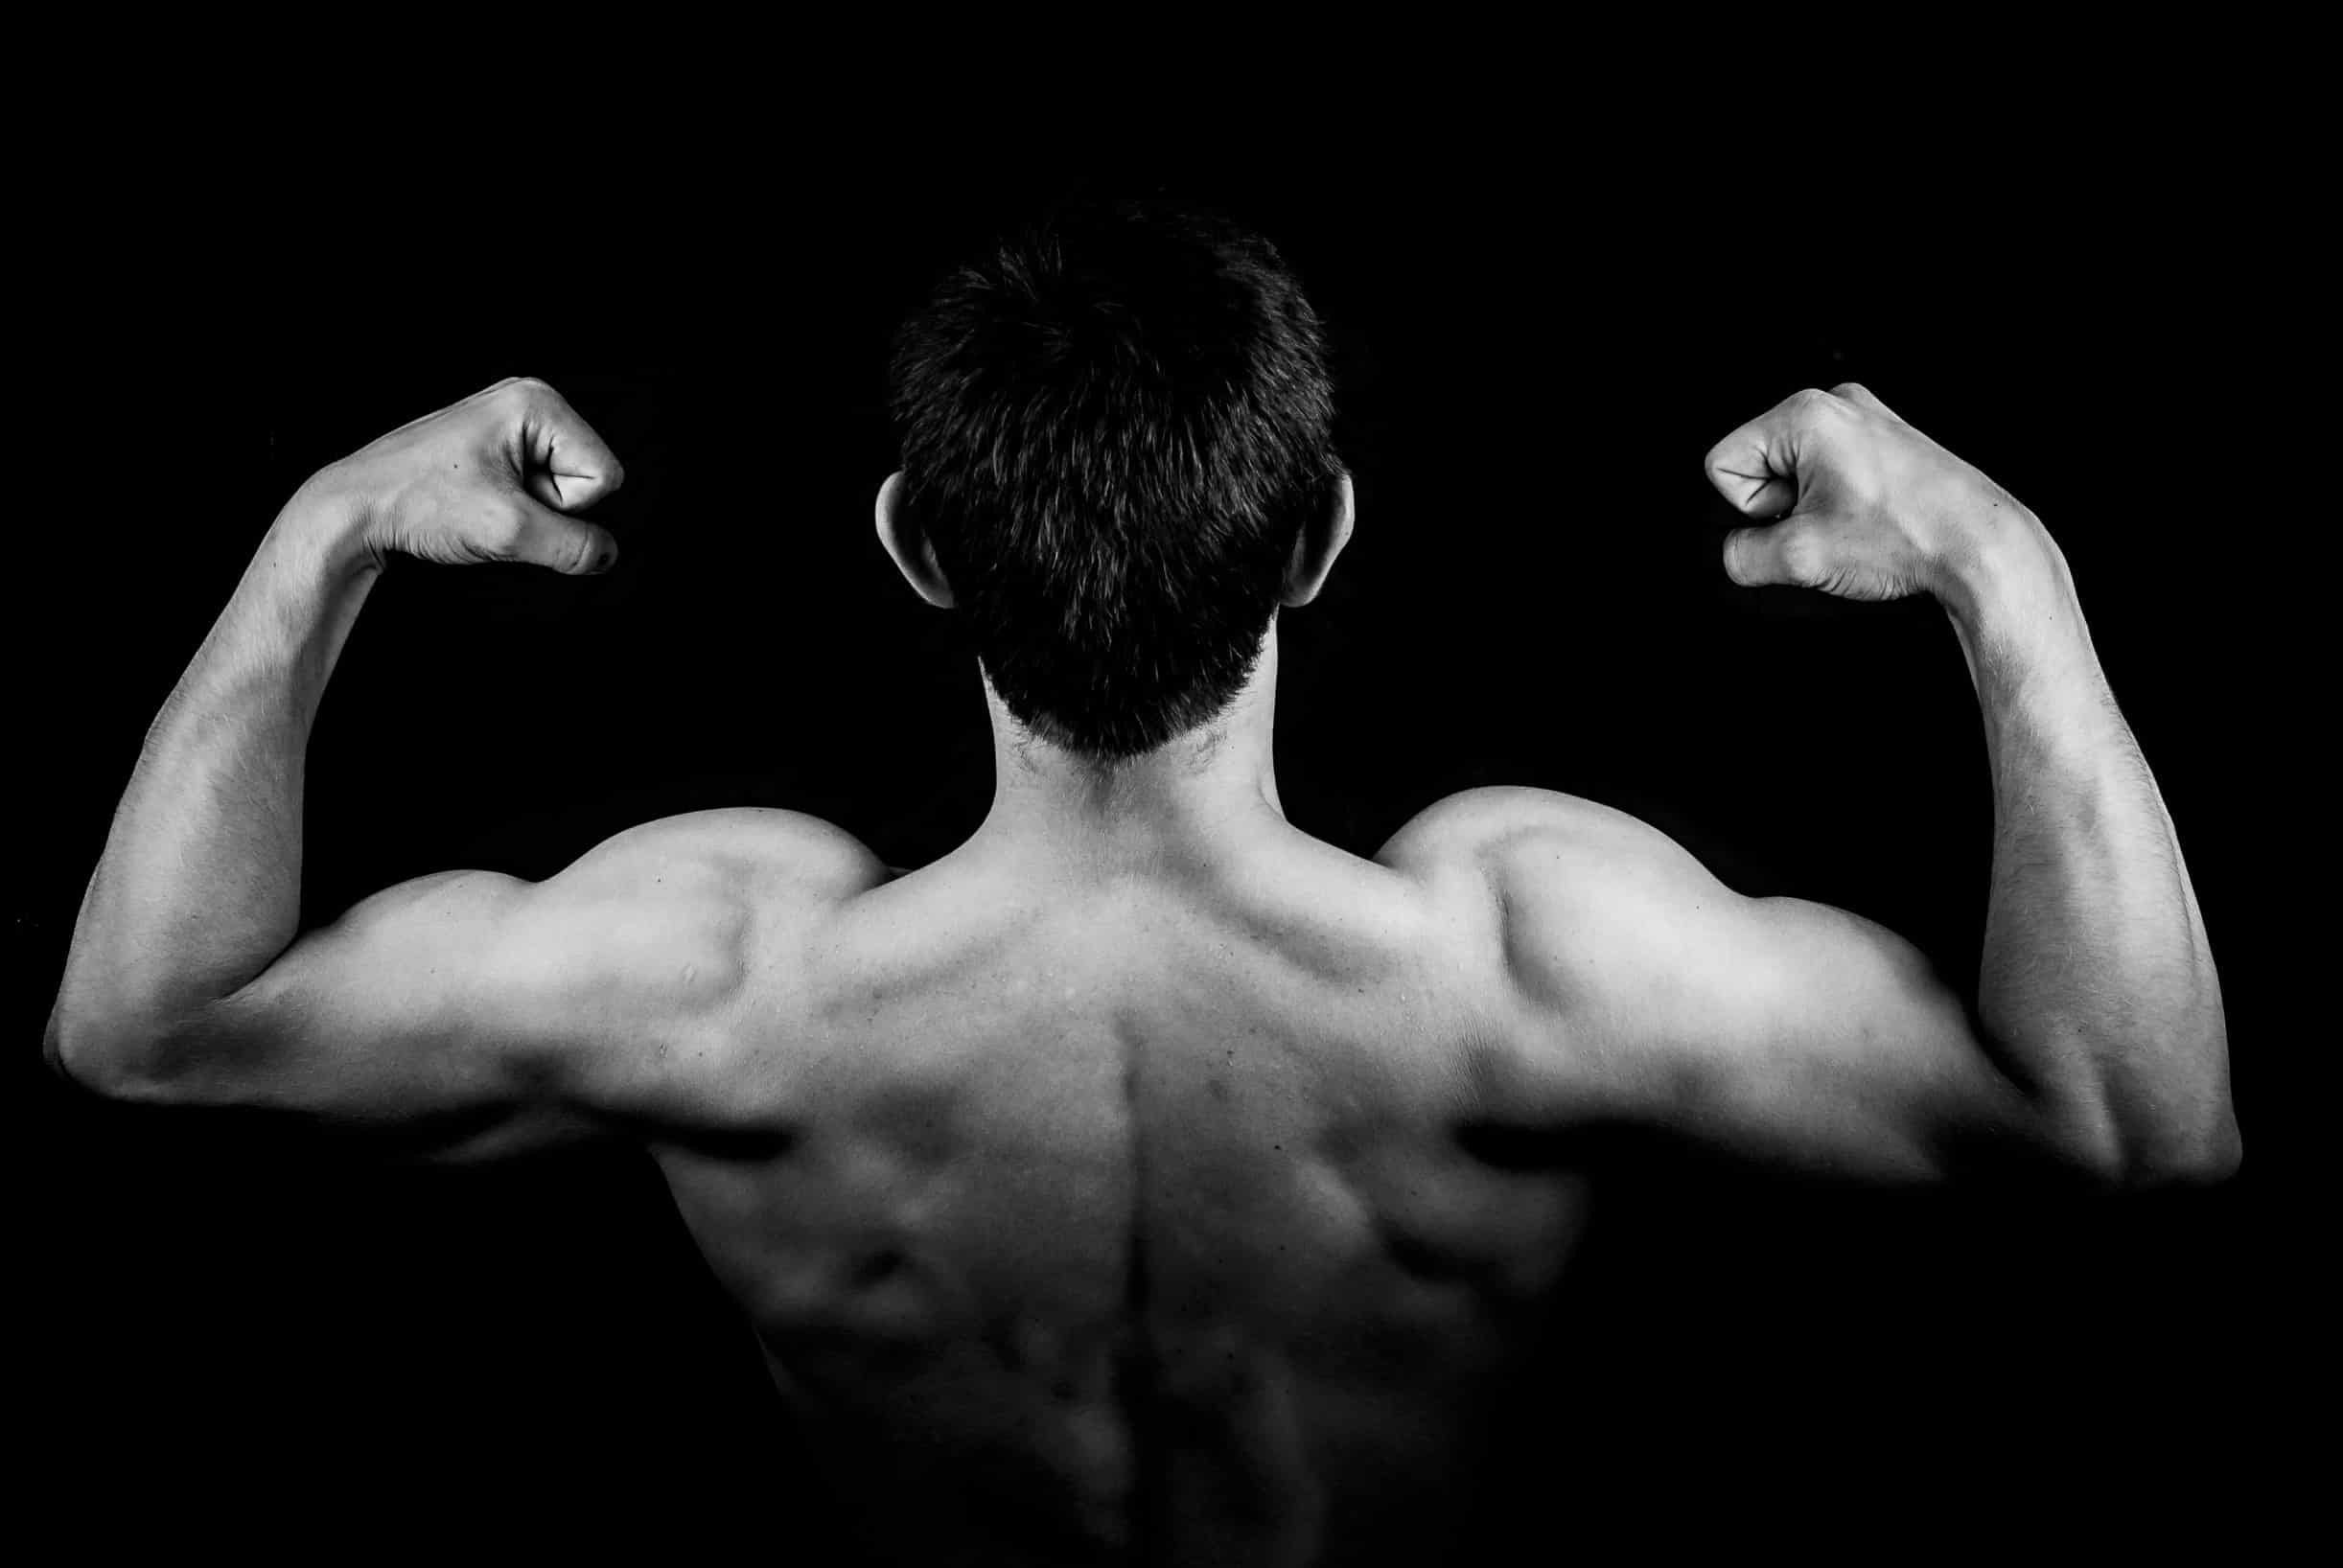 Muskelaufbau zum Zunehmen